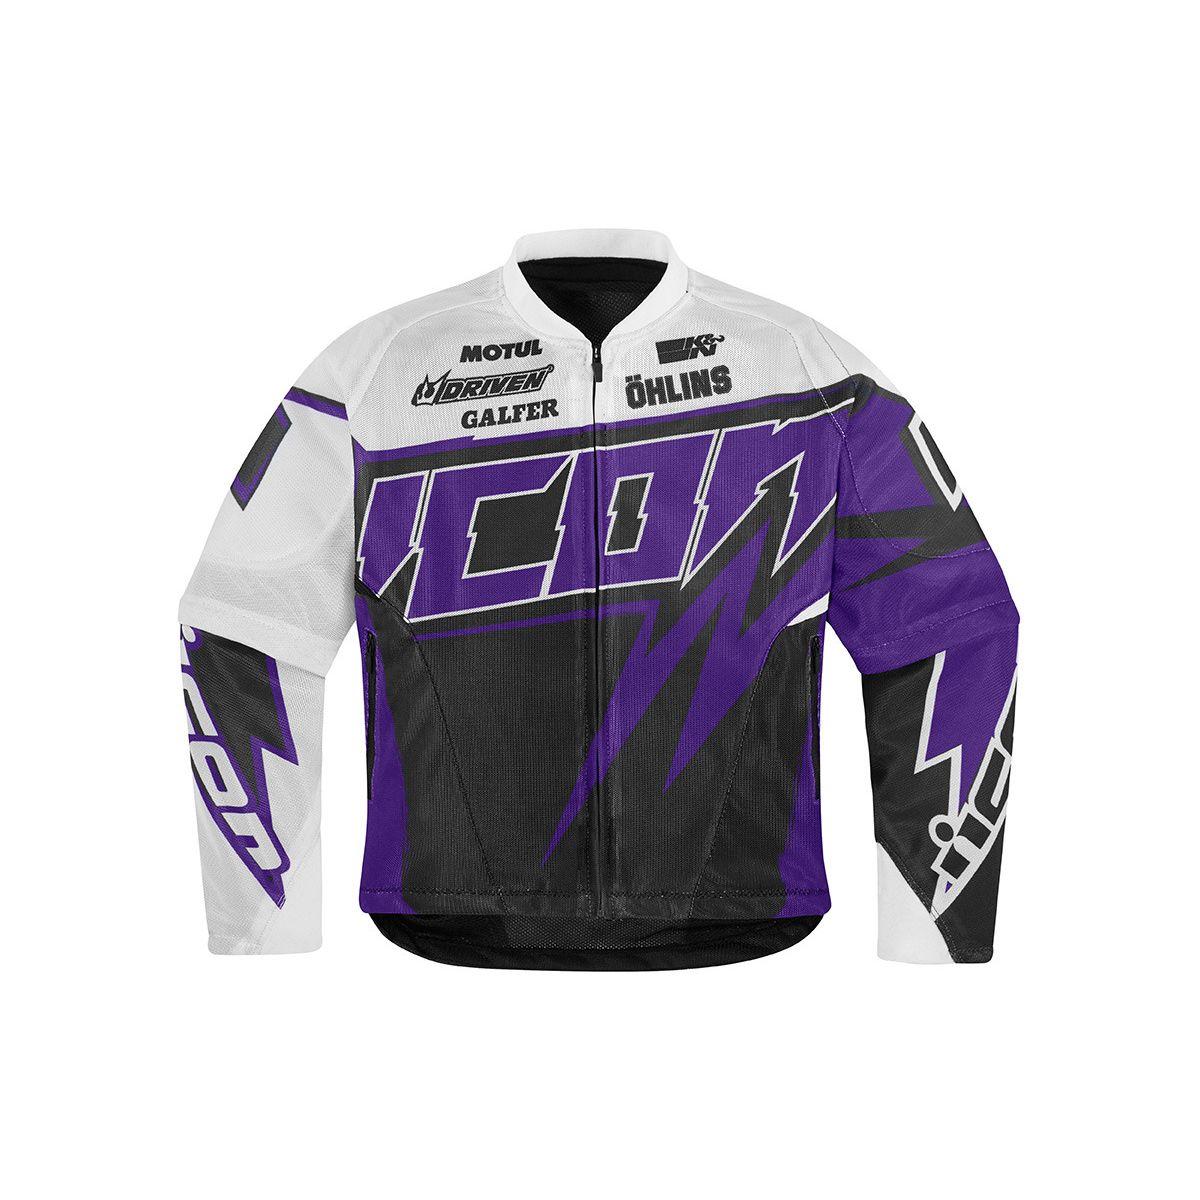 Мотокуртка женская Icon Icon Spaztyk Street Jersey, цвет: фиолетовый. Размер XS2822-0657